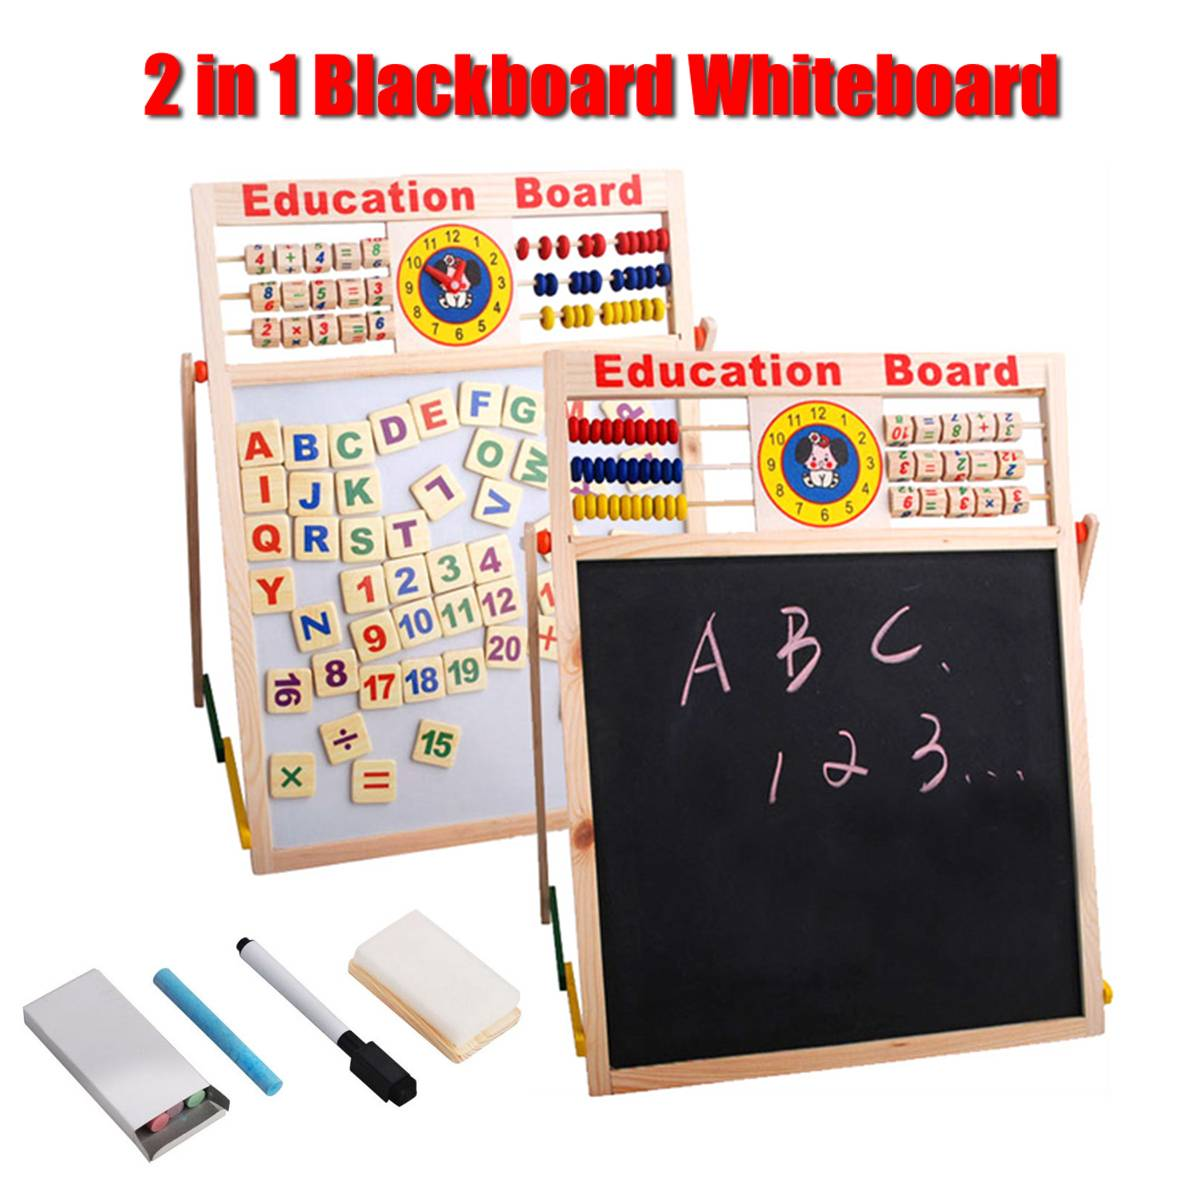 2 In 1 Wooden Blackboard Whiteboard Kit Children Drawing Writing Memo Board Alphabet Number Magnet Chalk Pen Kids Gifts Foldable